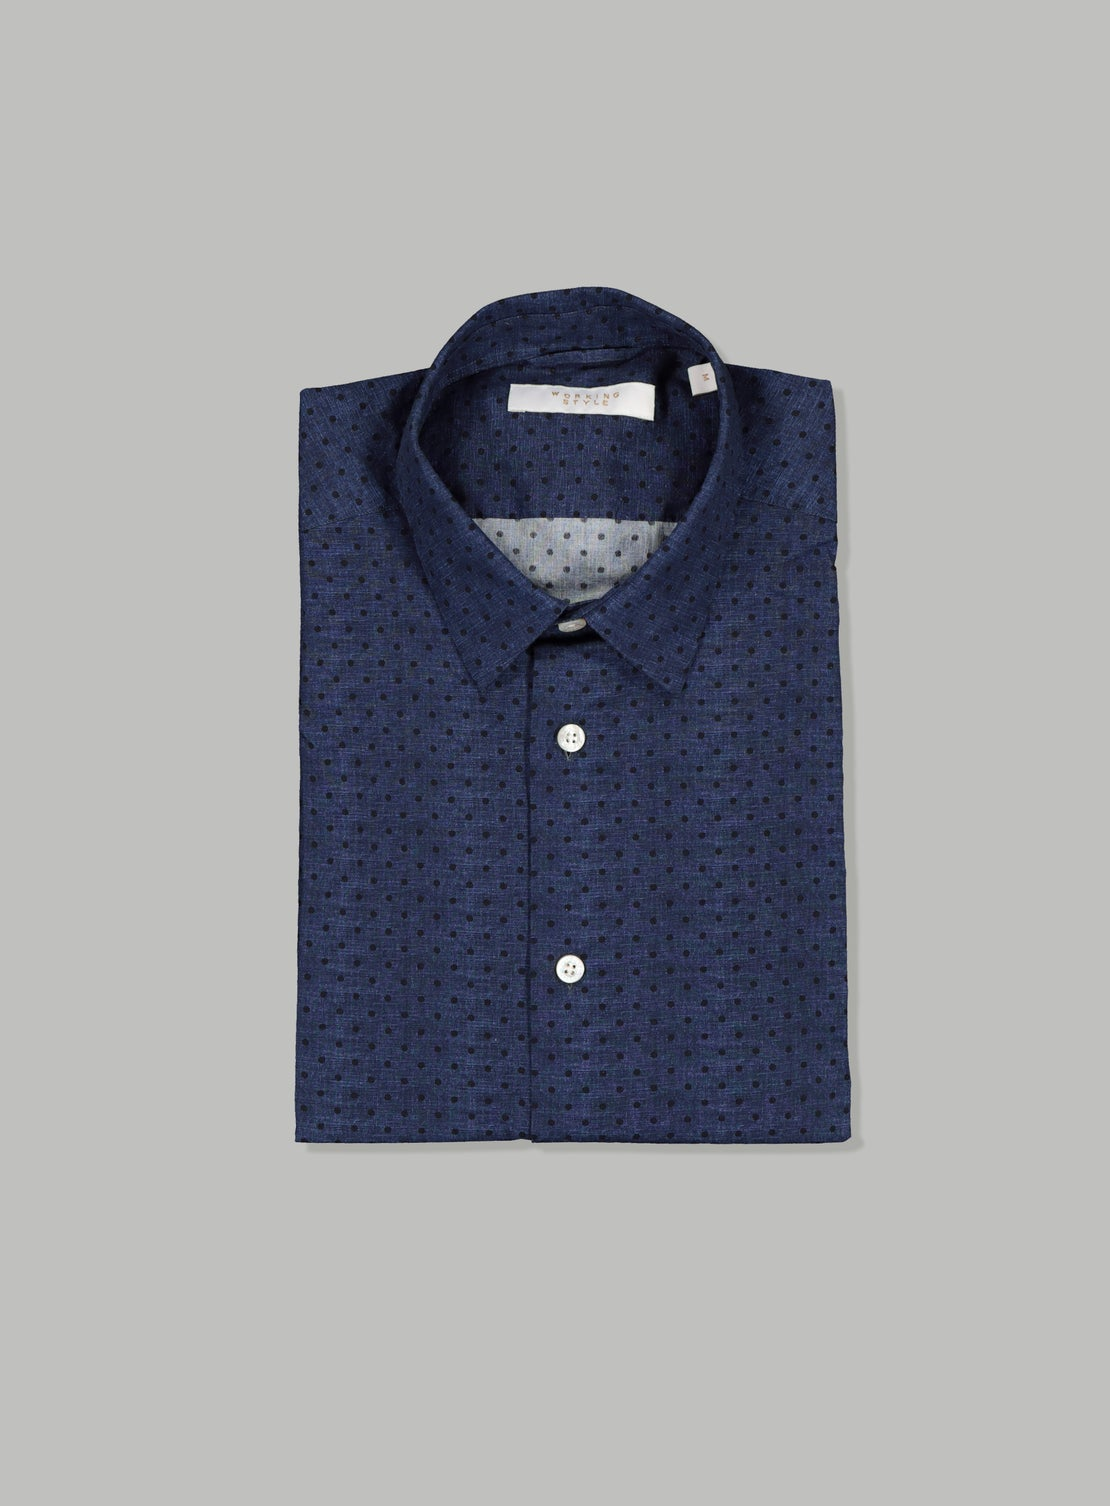 Indigo Denim with Black Dots Shirt